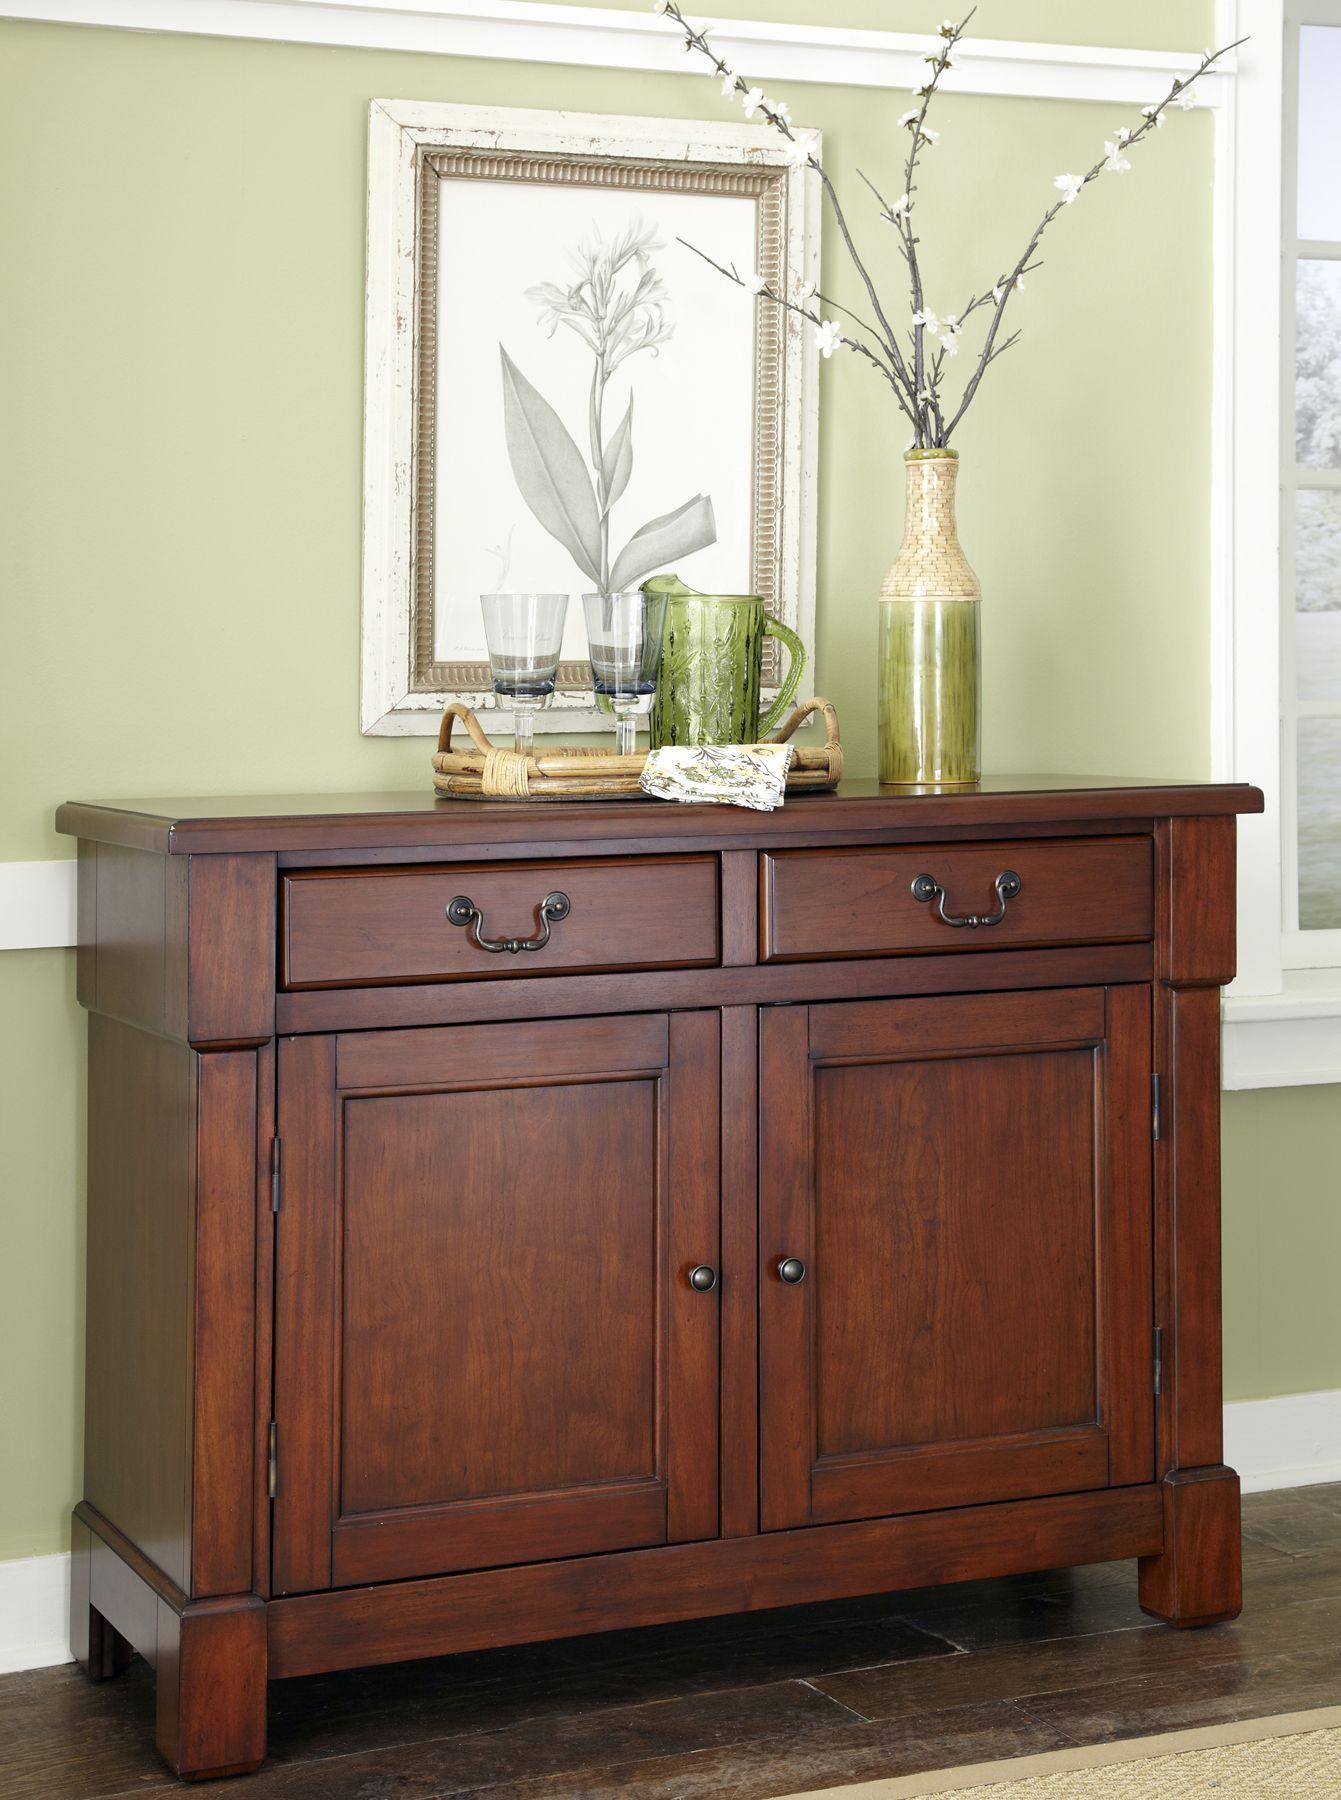 Kitchen Buffet Cabinet Hutch Home Decor